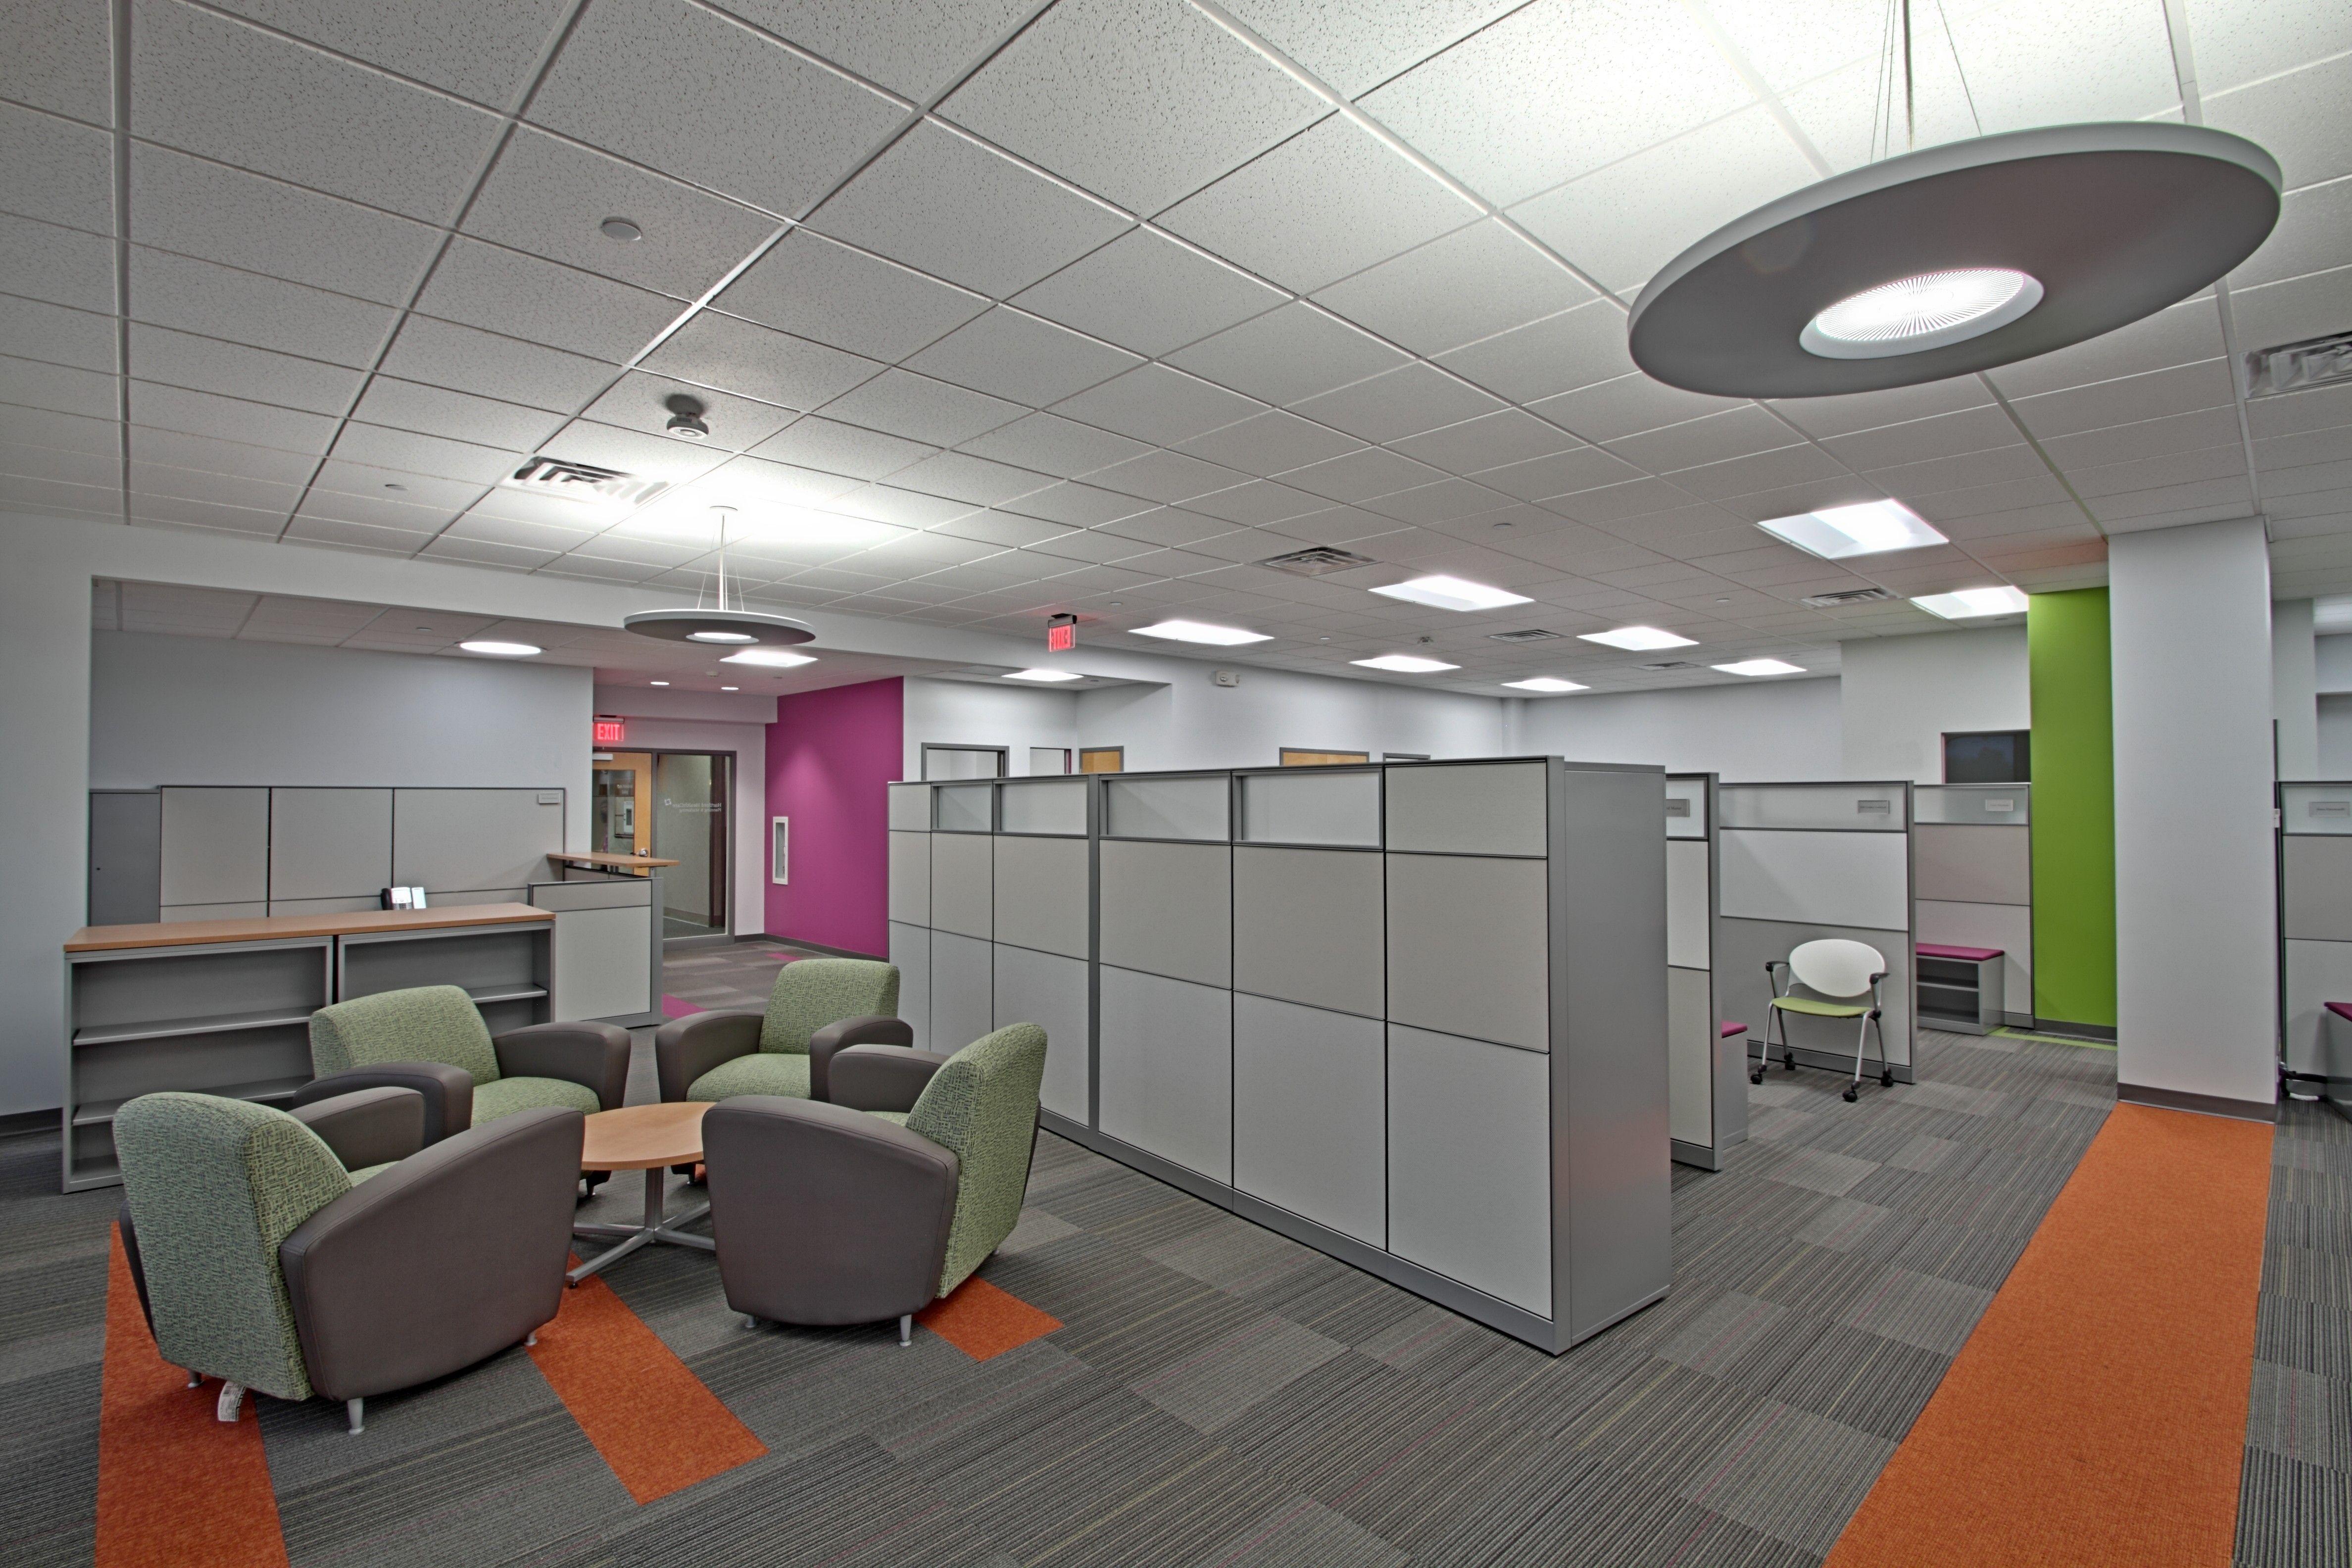 Hartford Hospital Marketing and Planning Department Renovation - in Newington, CT #smalloffice #commercialspaces #commercialinteriors #design #flooring